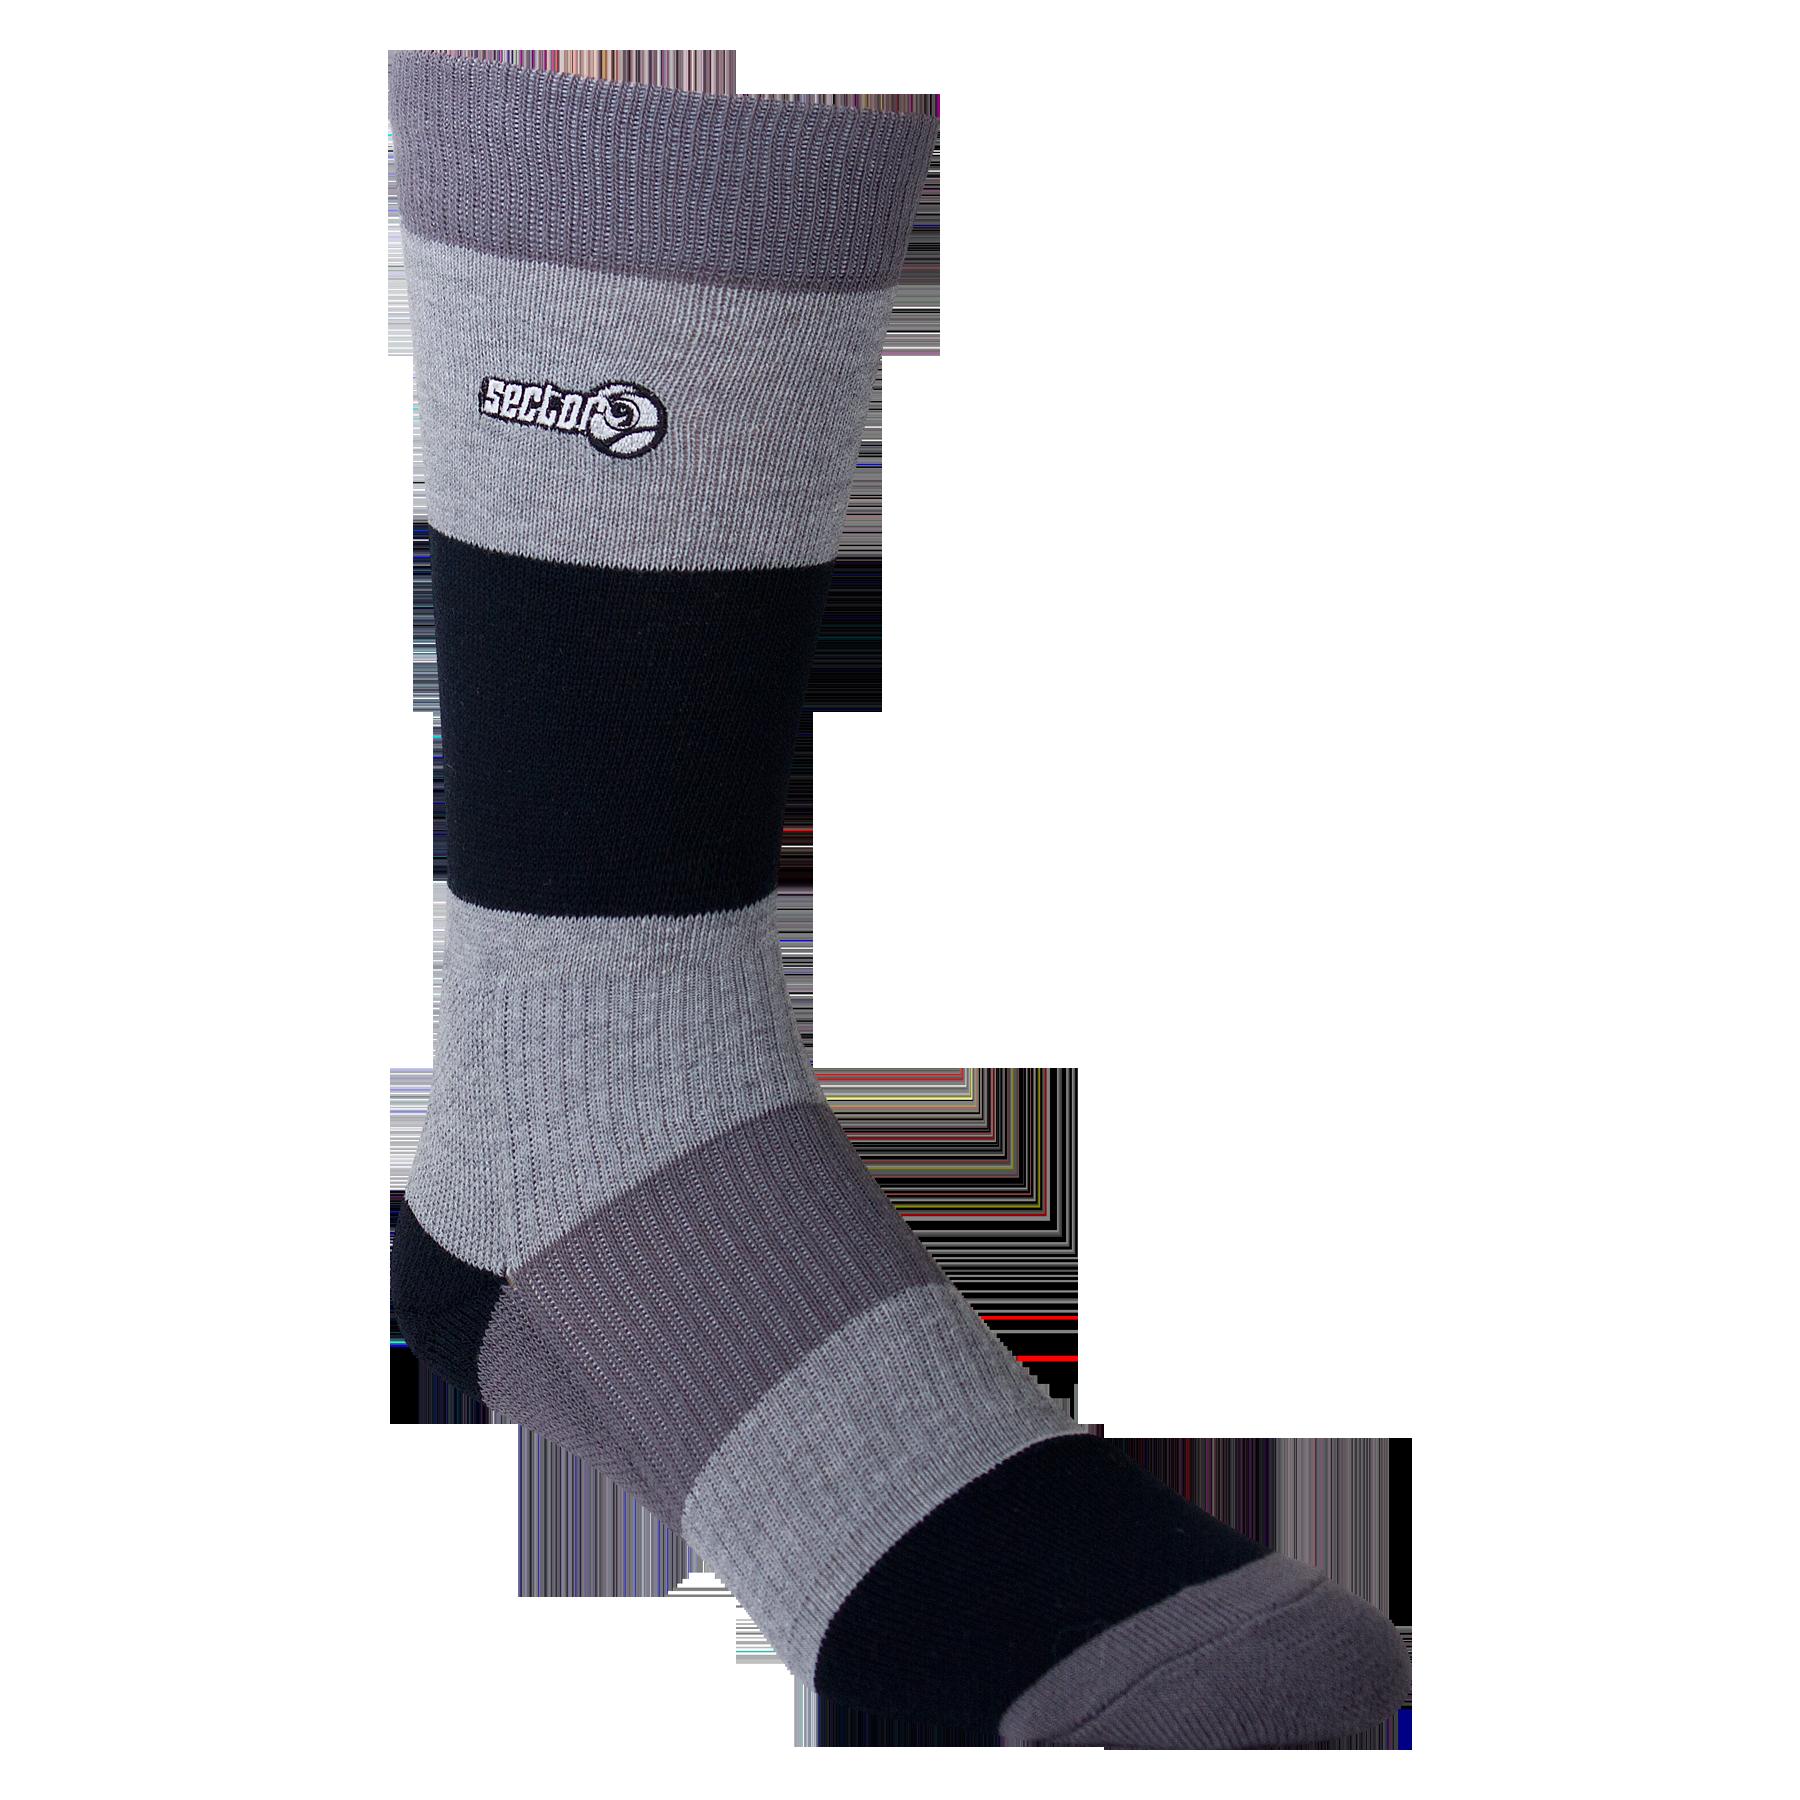 Socks PNG images free download.